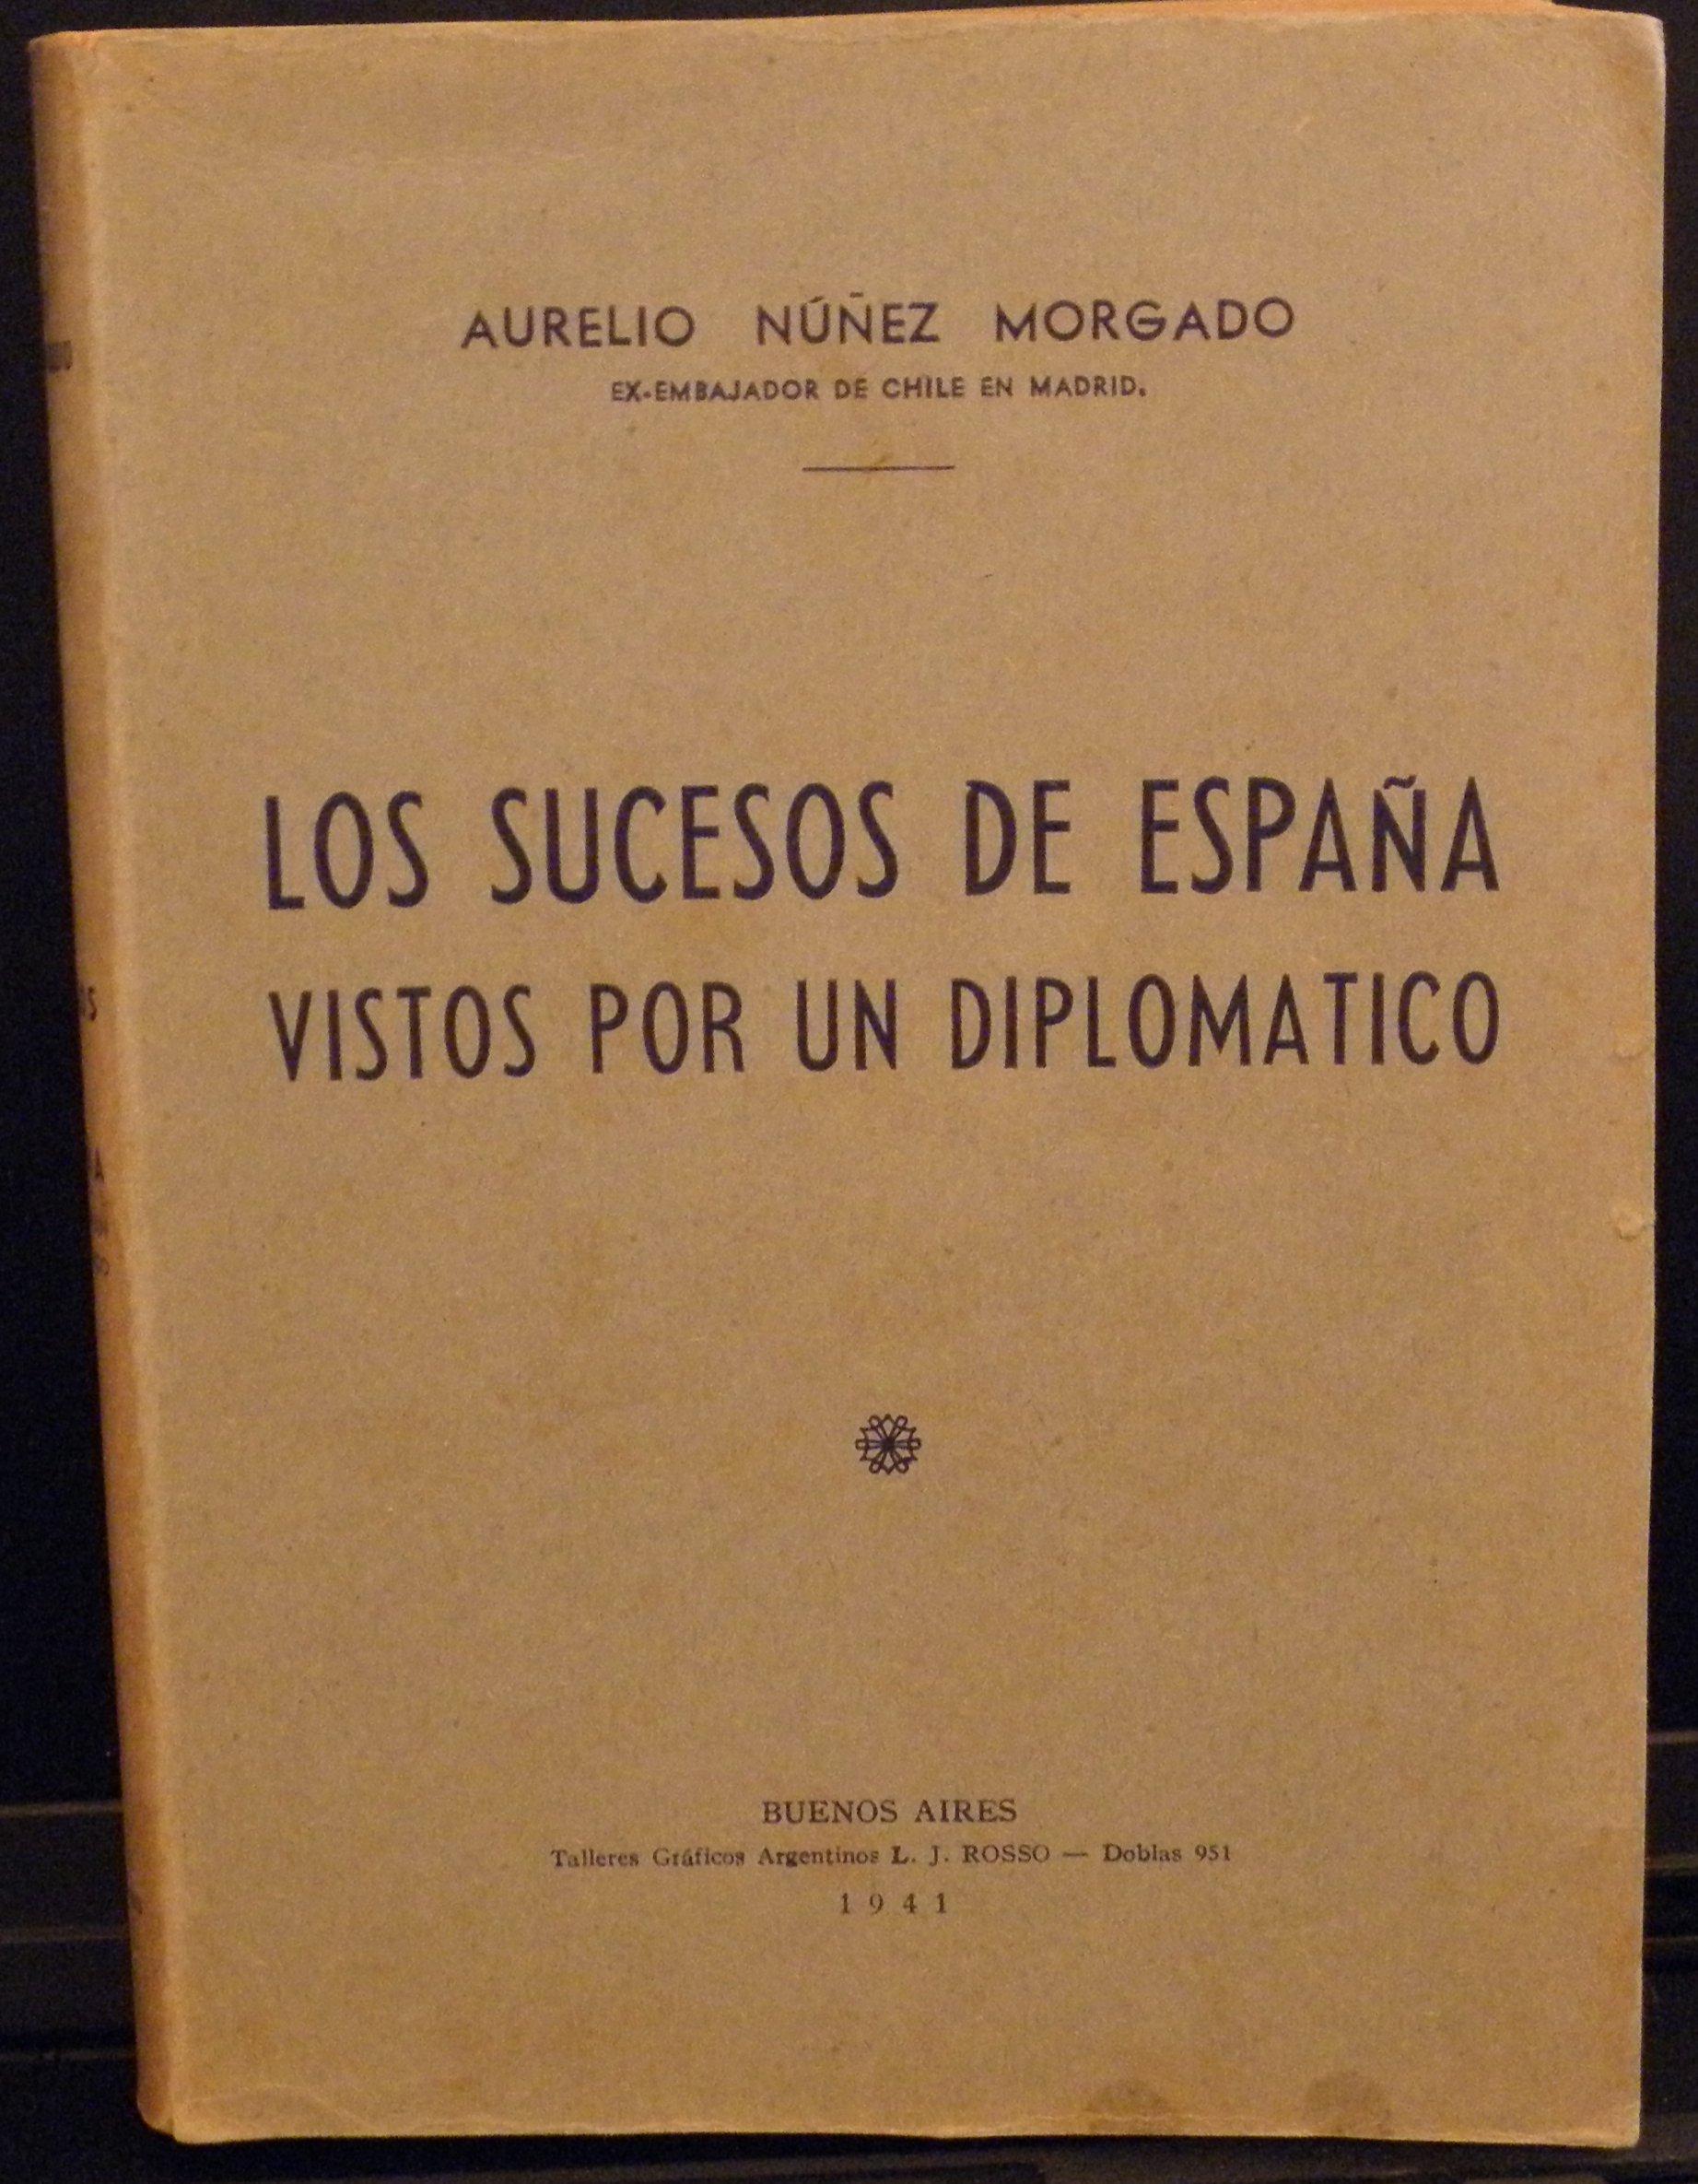 Aurelio Núñez Morgado